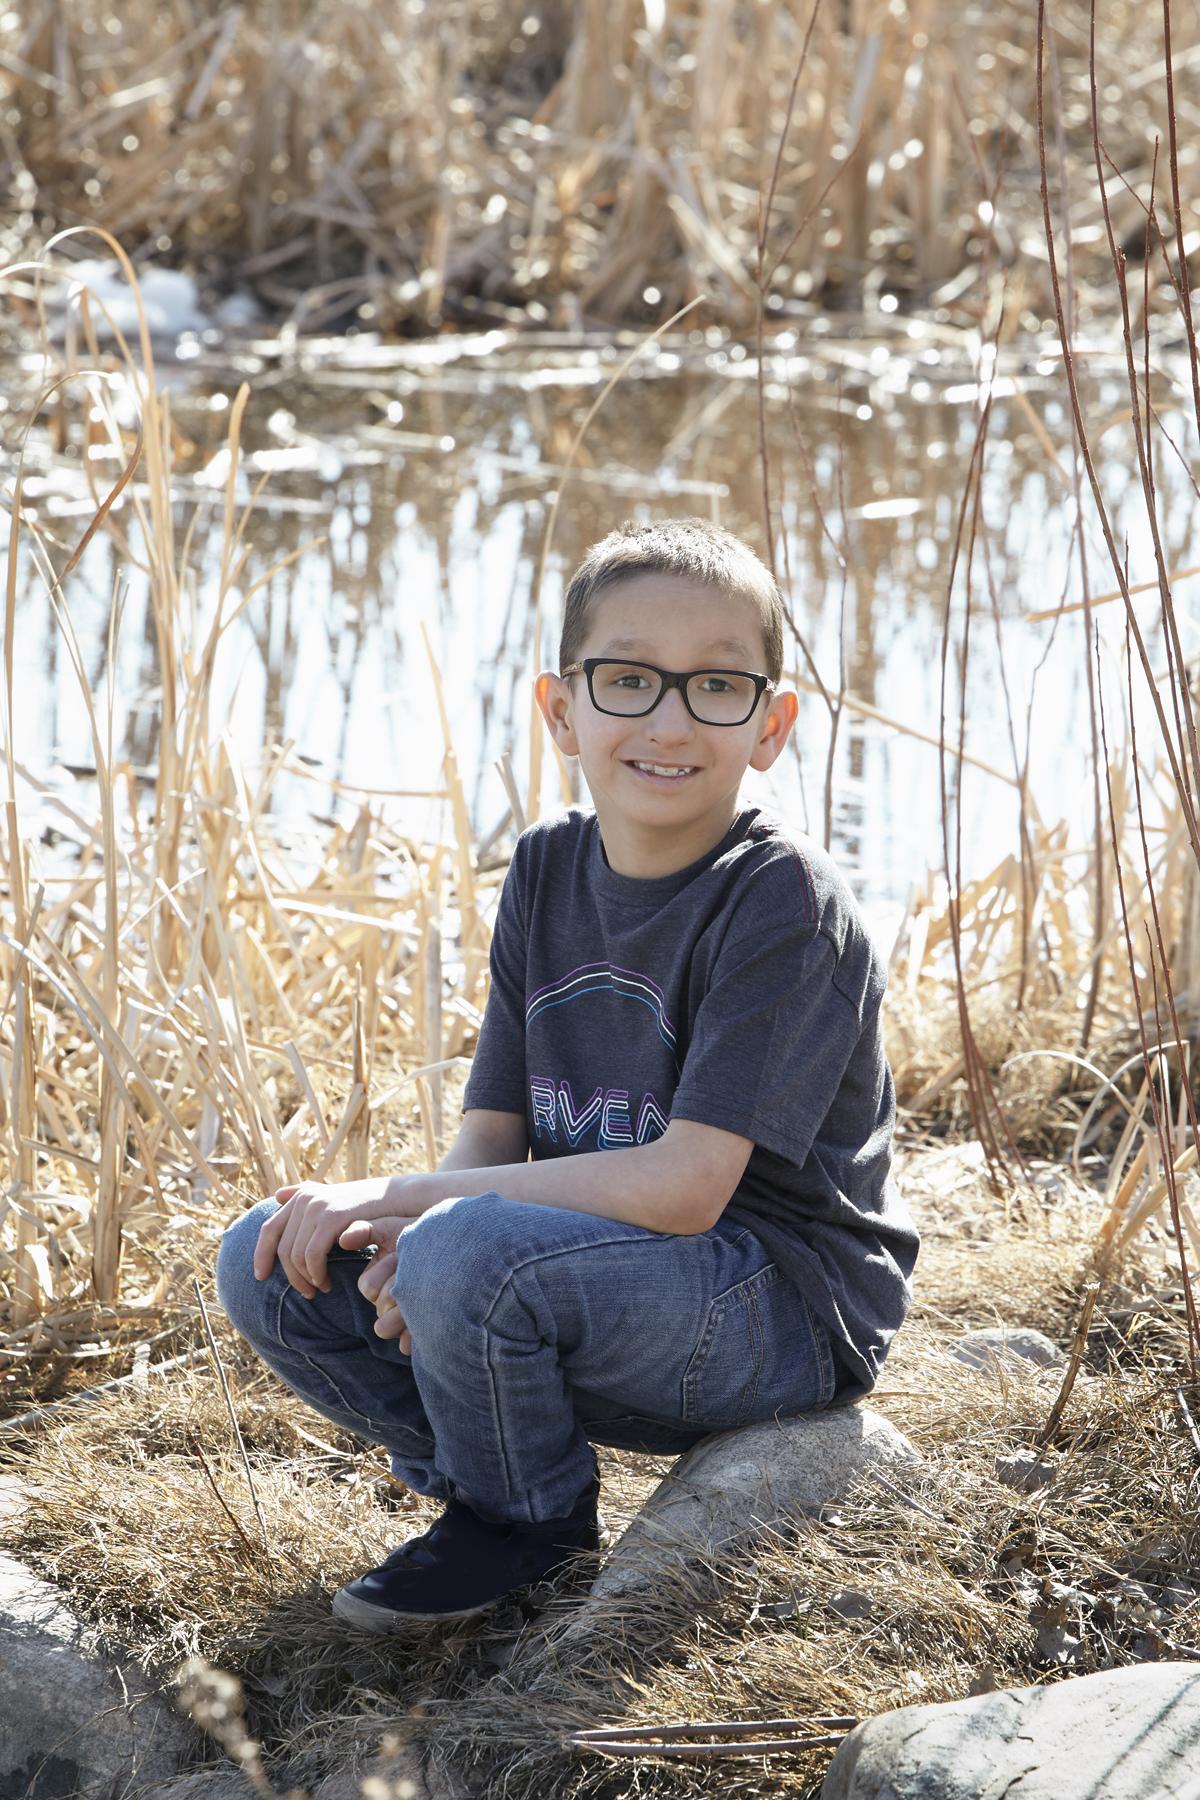 cindy-moleski-professional-photographer-saskatoon-portrait-kids-tweens-29504-0071e.jpg